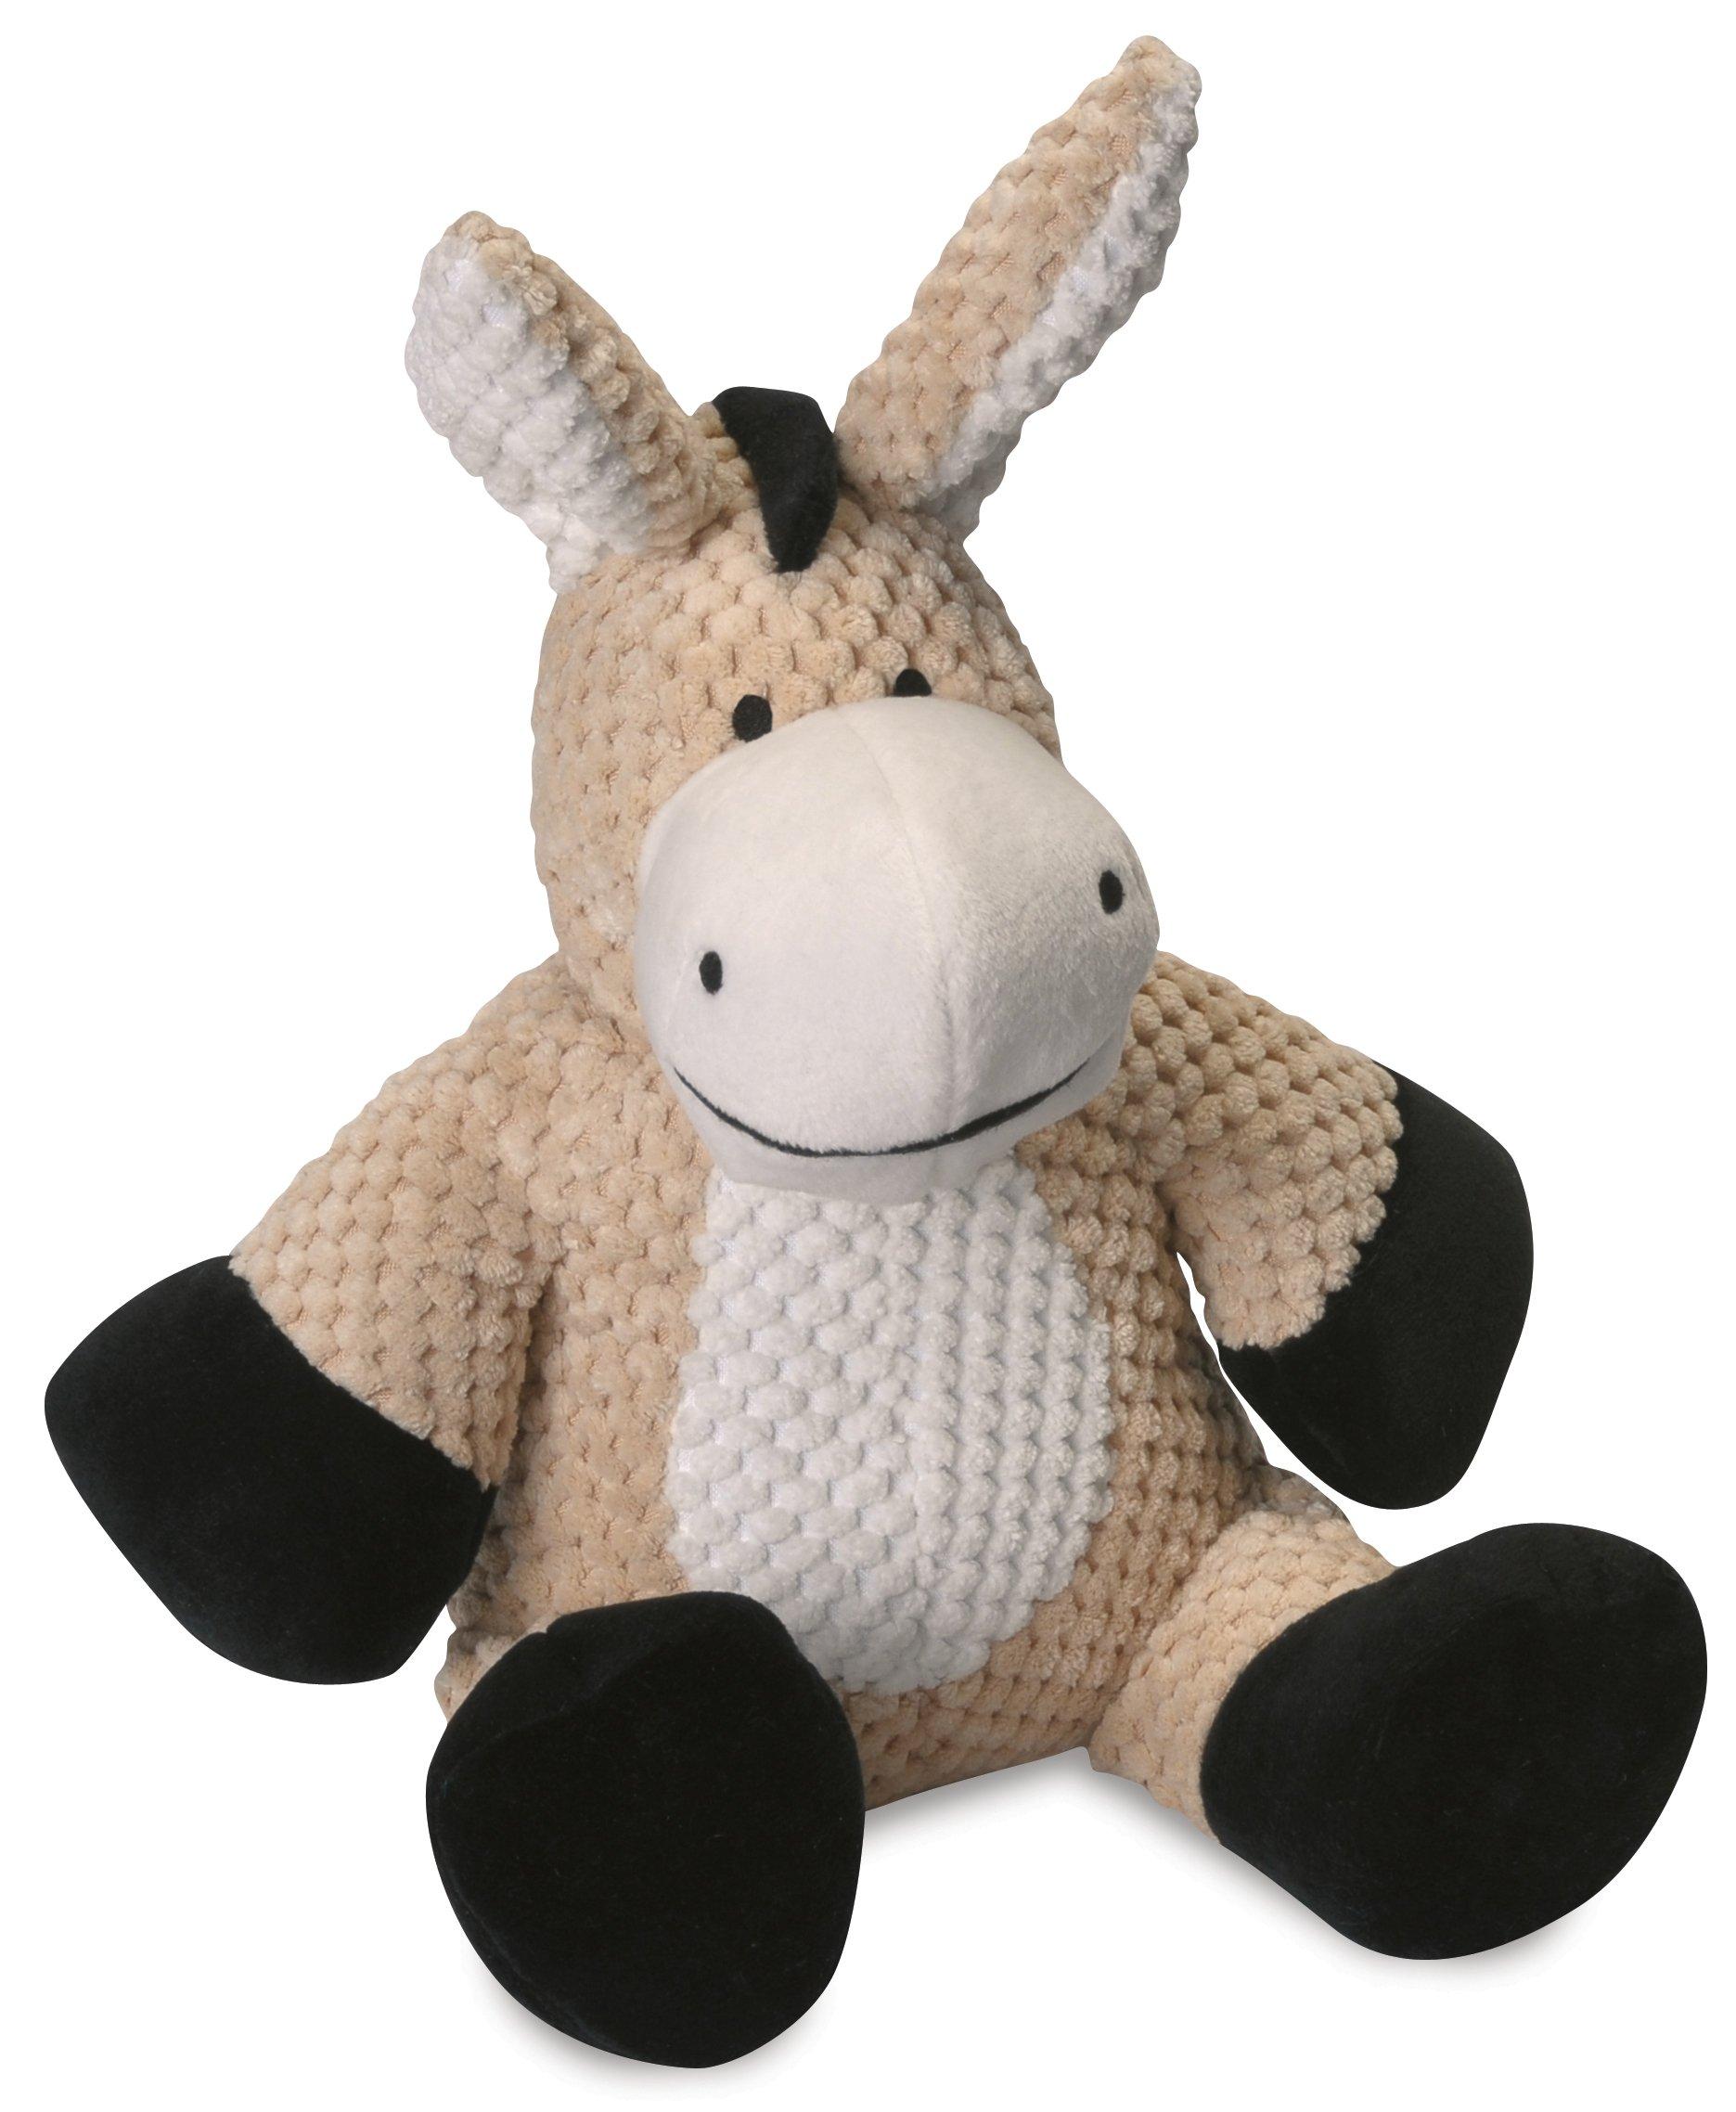 goDog Checkers Donkey With Chew Guard Technology Tough Plush Dog Toy, Tan, Large